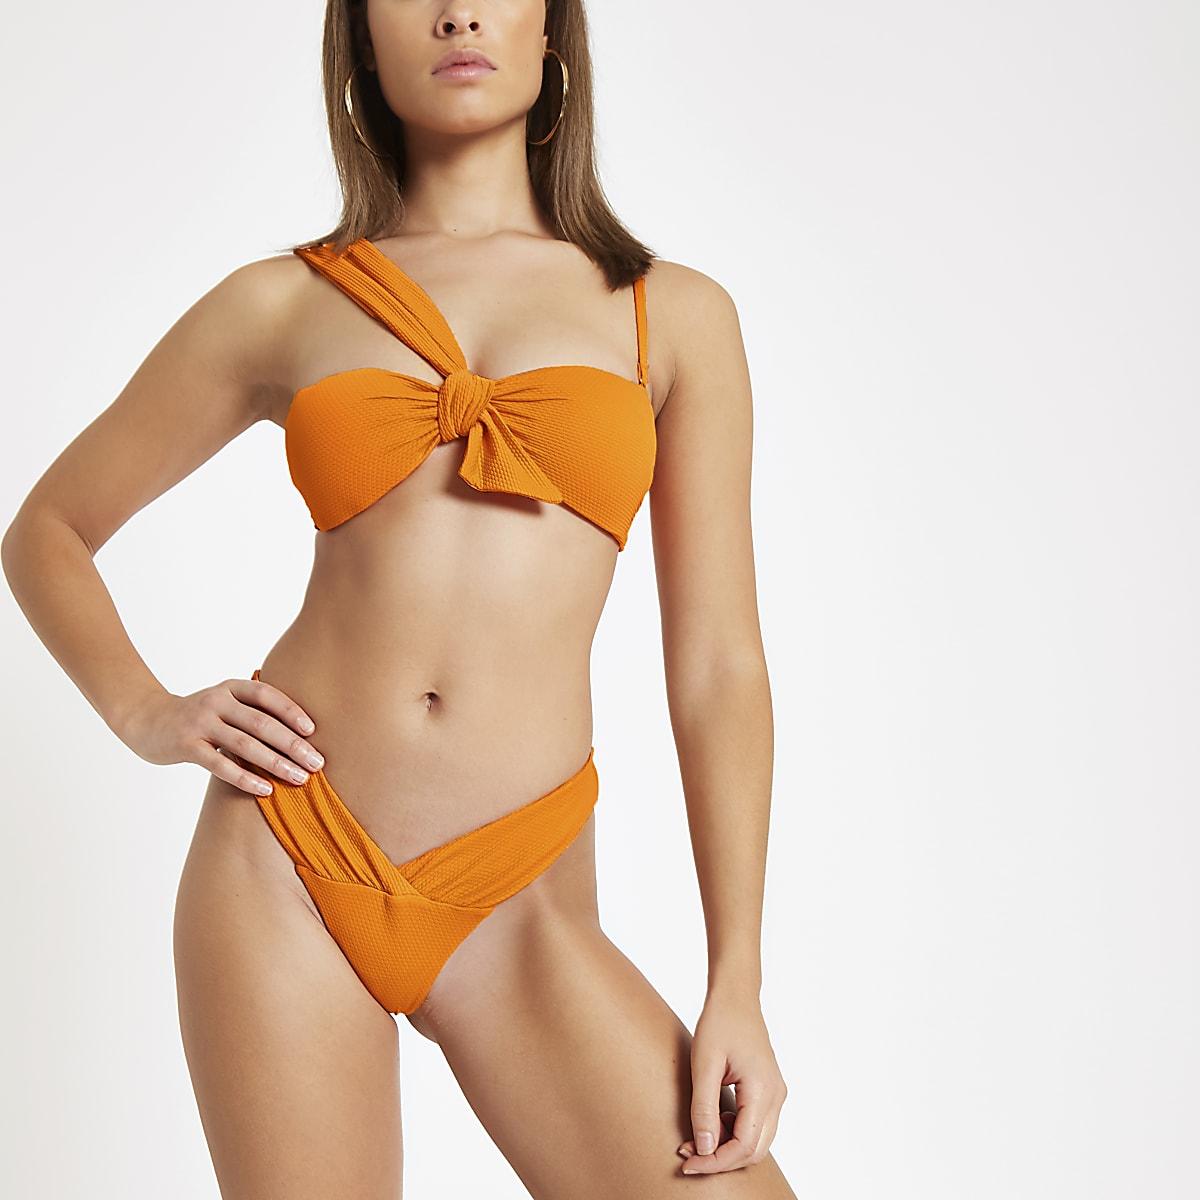 Orange textured low rise bikini bottoms